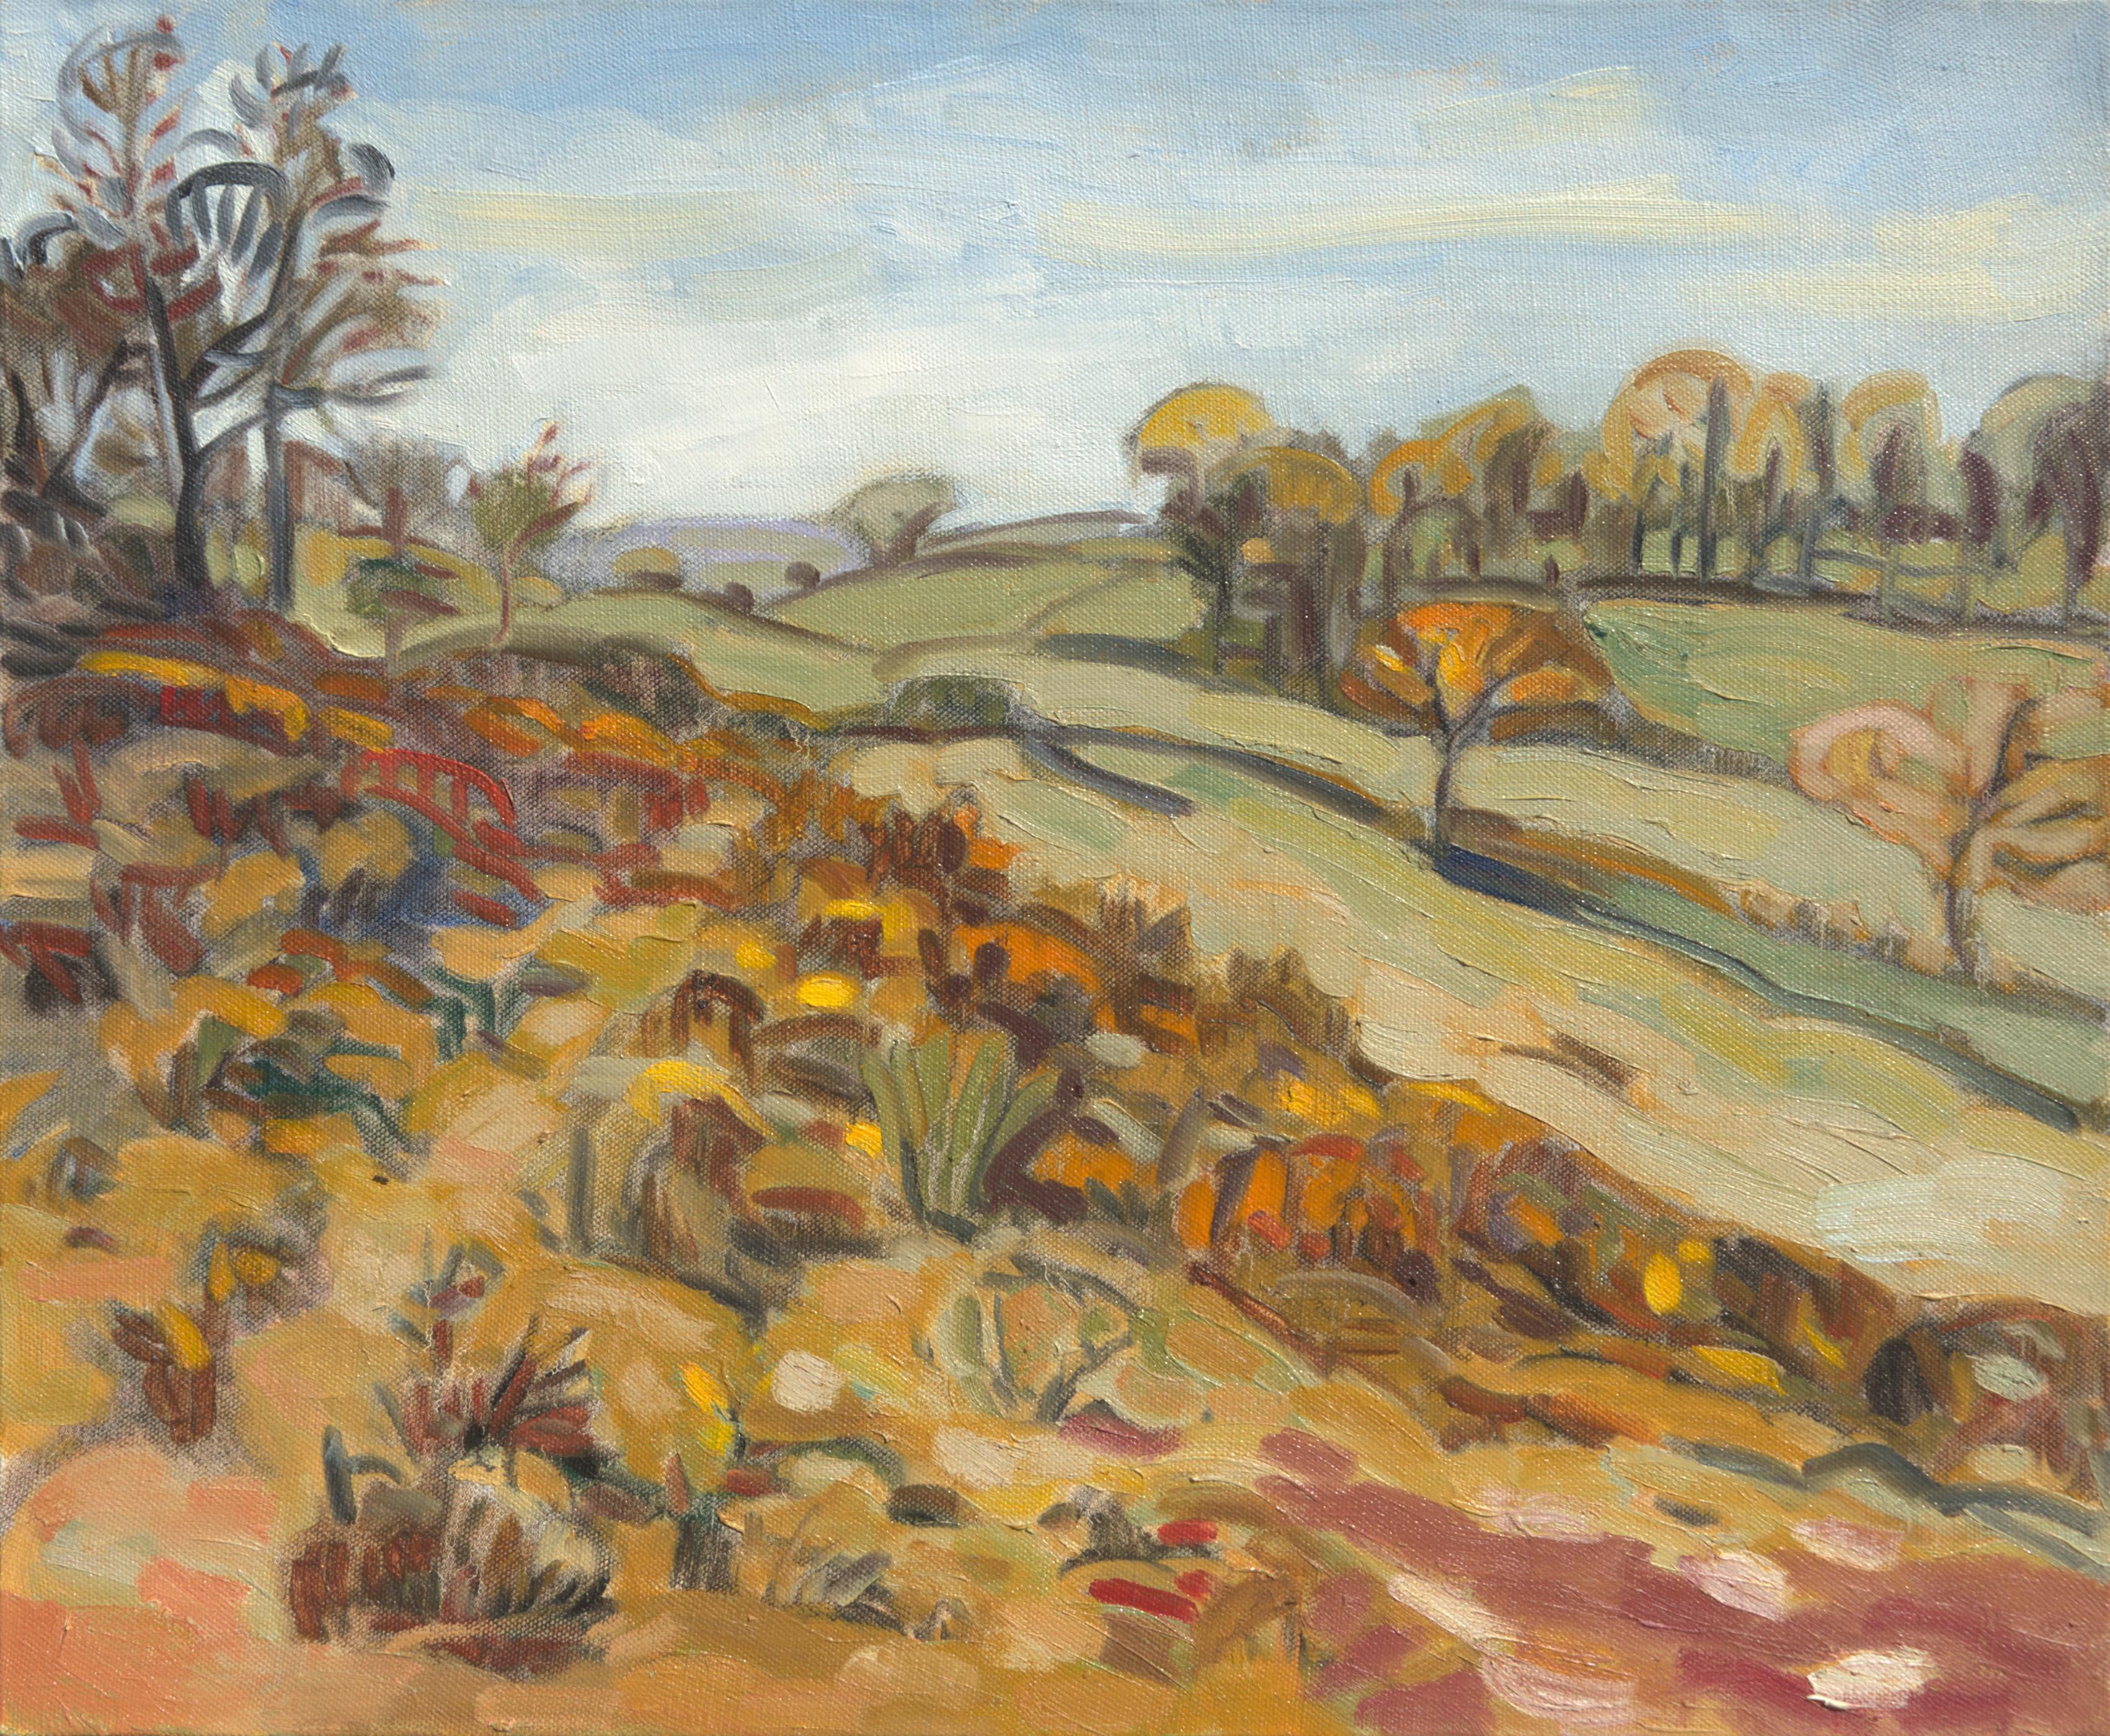 """Prairie with Ferns"", Warm Automn Rural Landscape Impressionist Oil Painting"